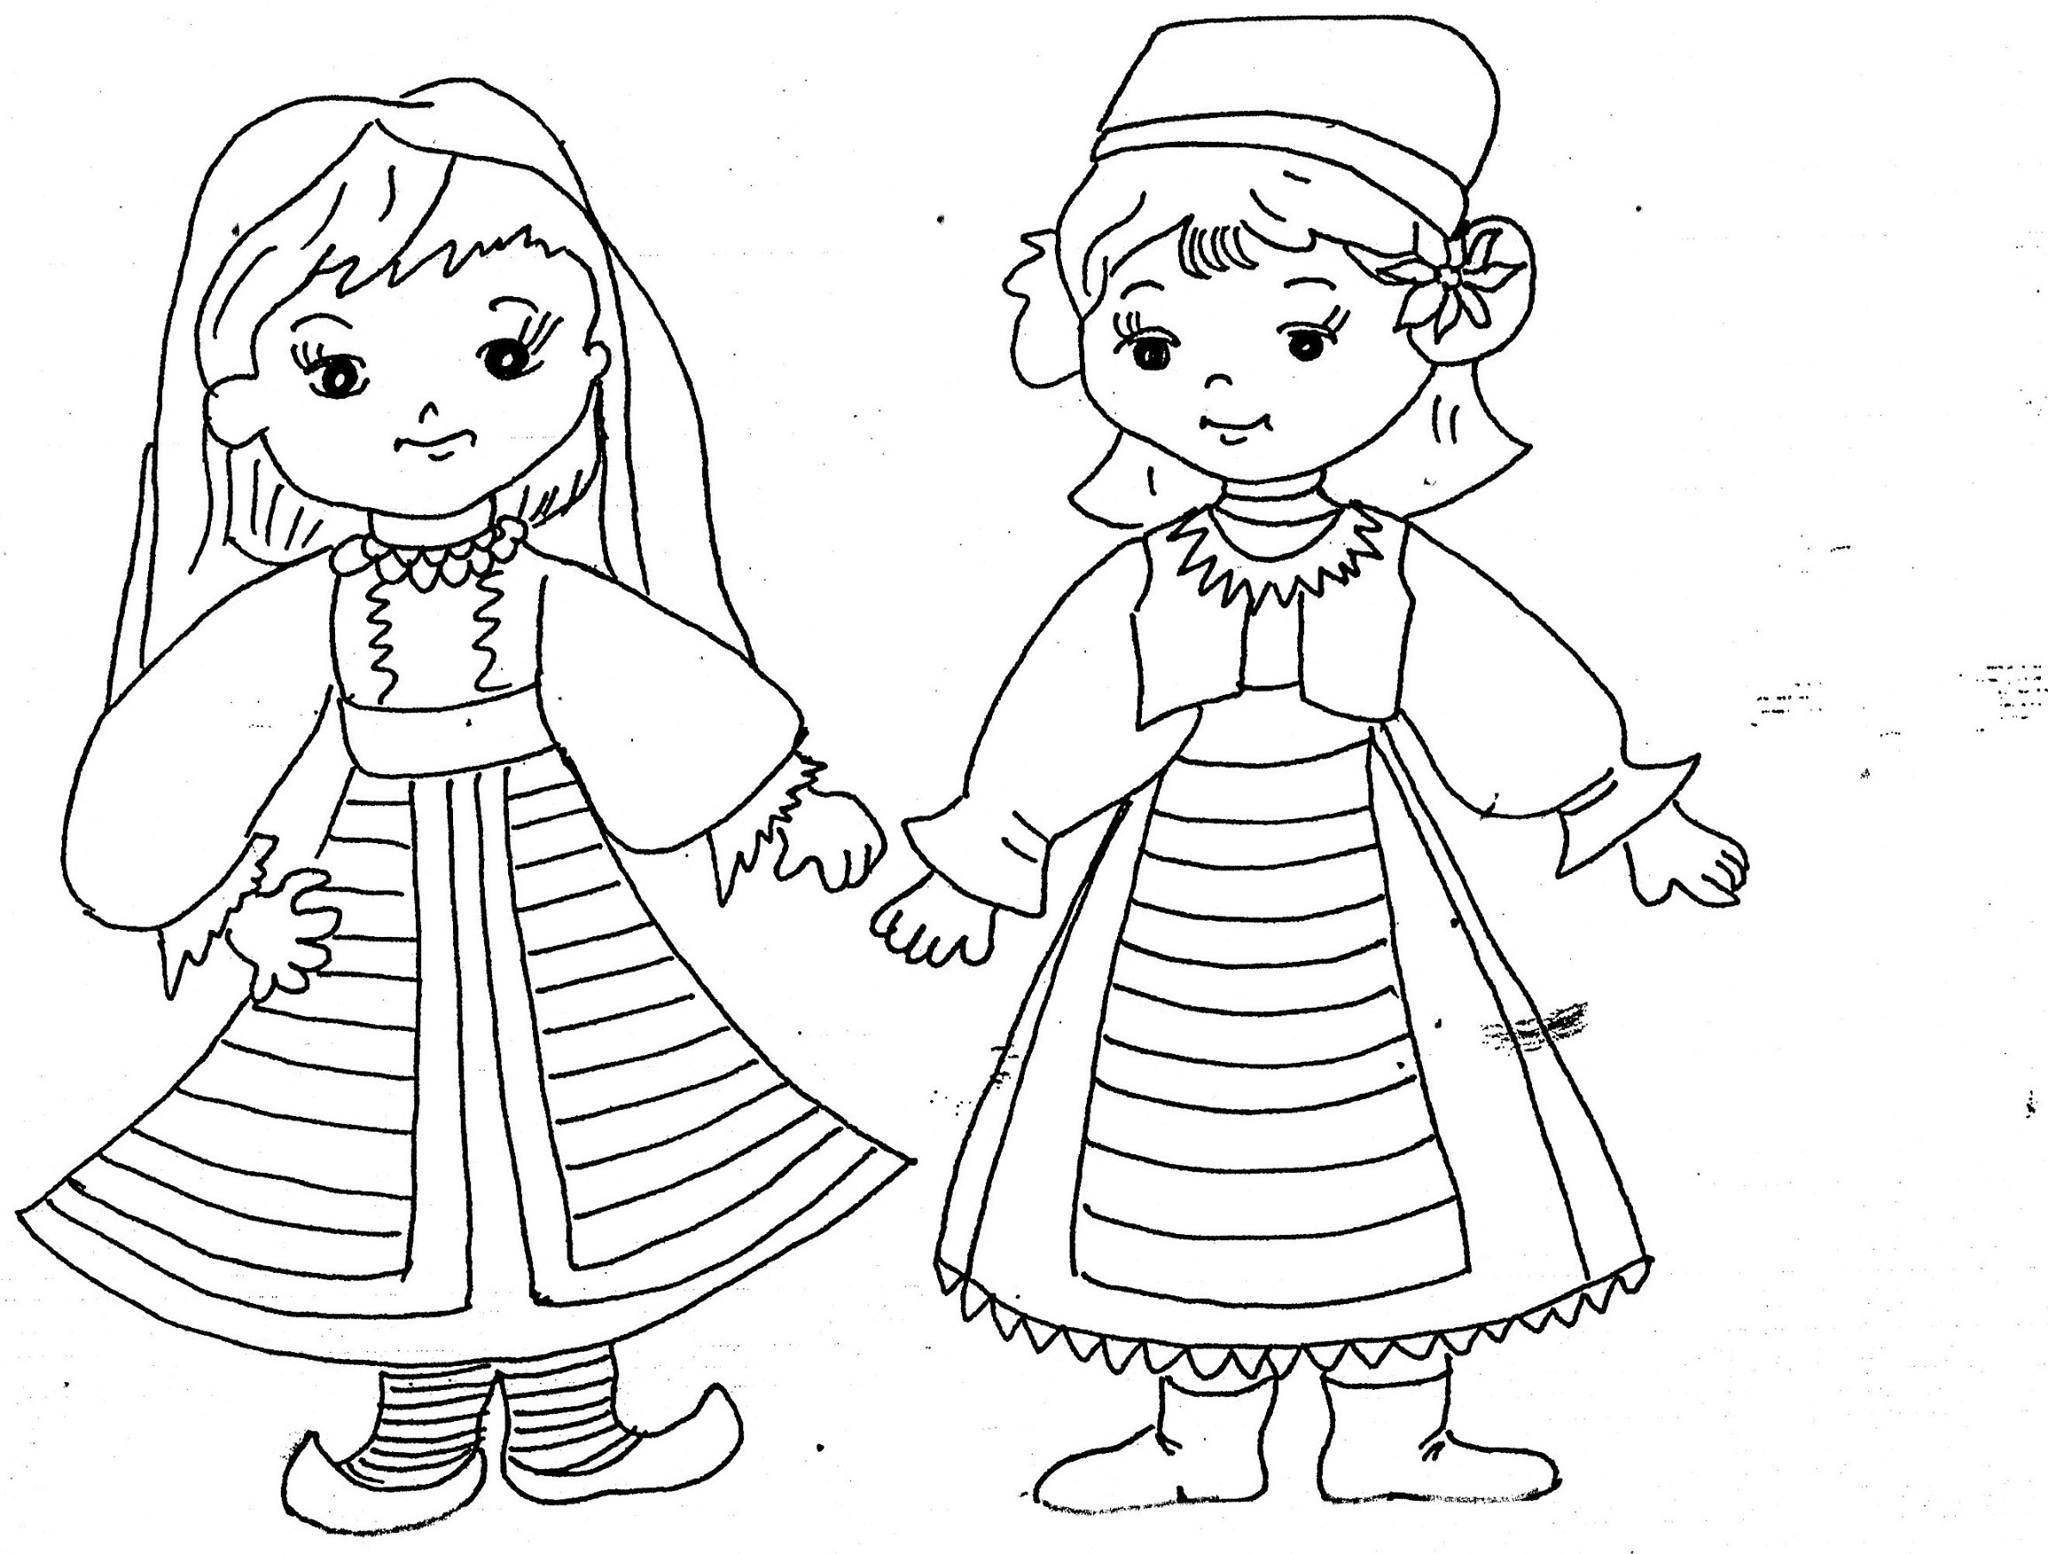 Copii Romania Decolorat Coloringpages Drawings Children Kids Kidsactivities